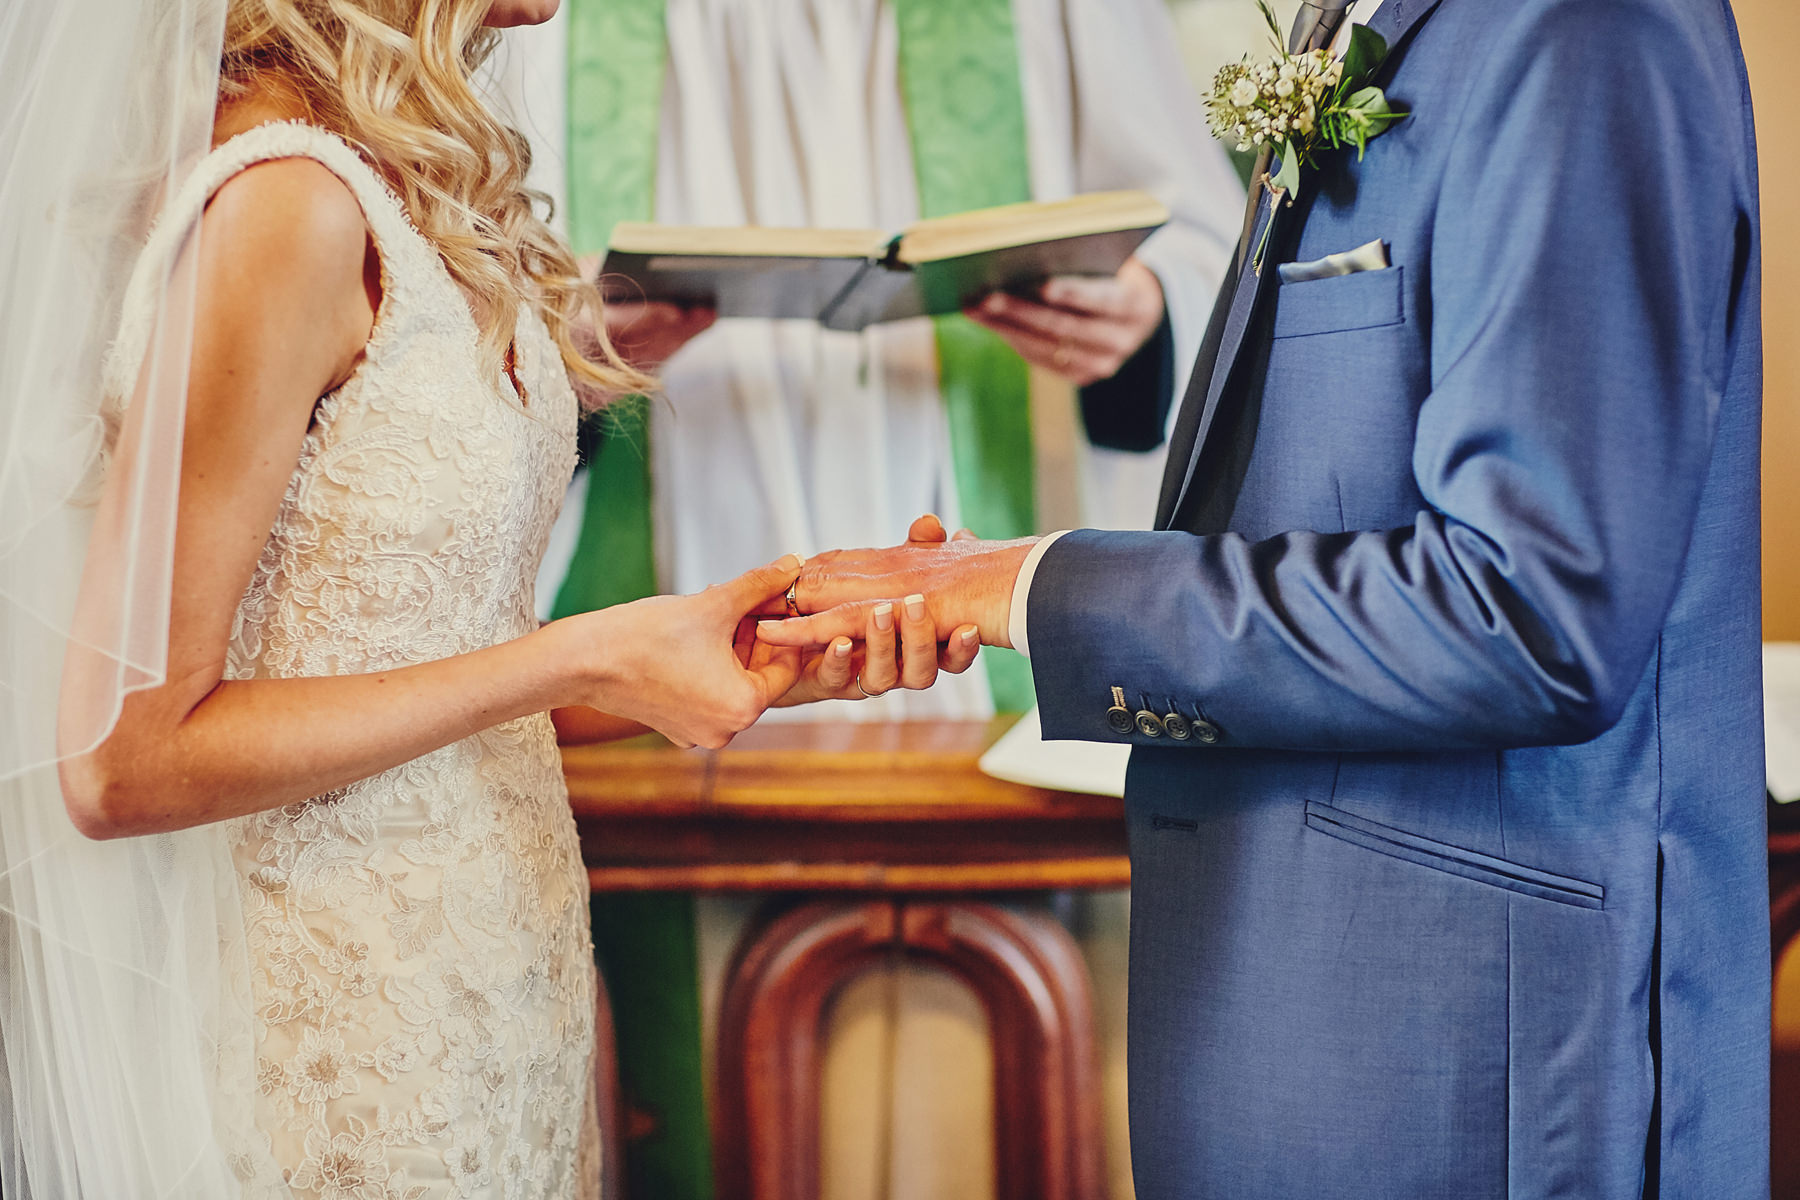 Wedding at Borris House co.Carlow 035 - Borris House wedding | Cara & David